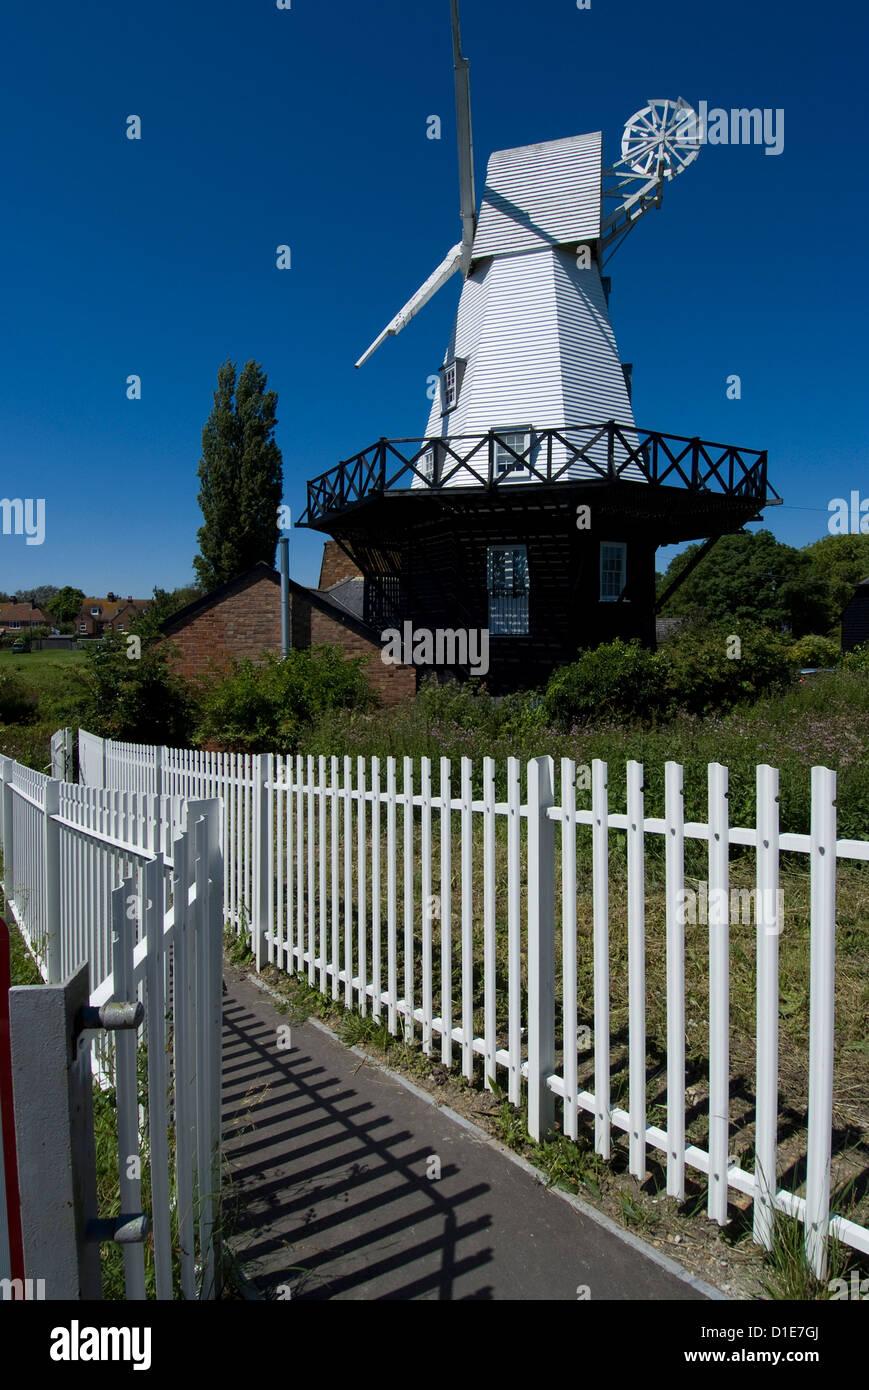 Rye windmill, Rye, East Sussex, England, United Kingdom, Europe - Stock Image